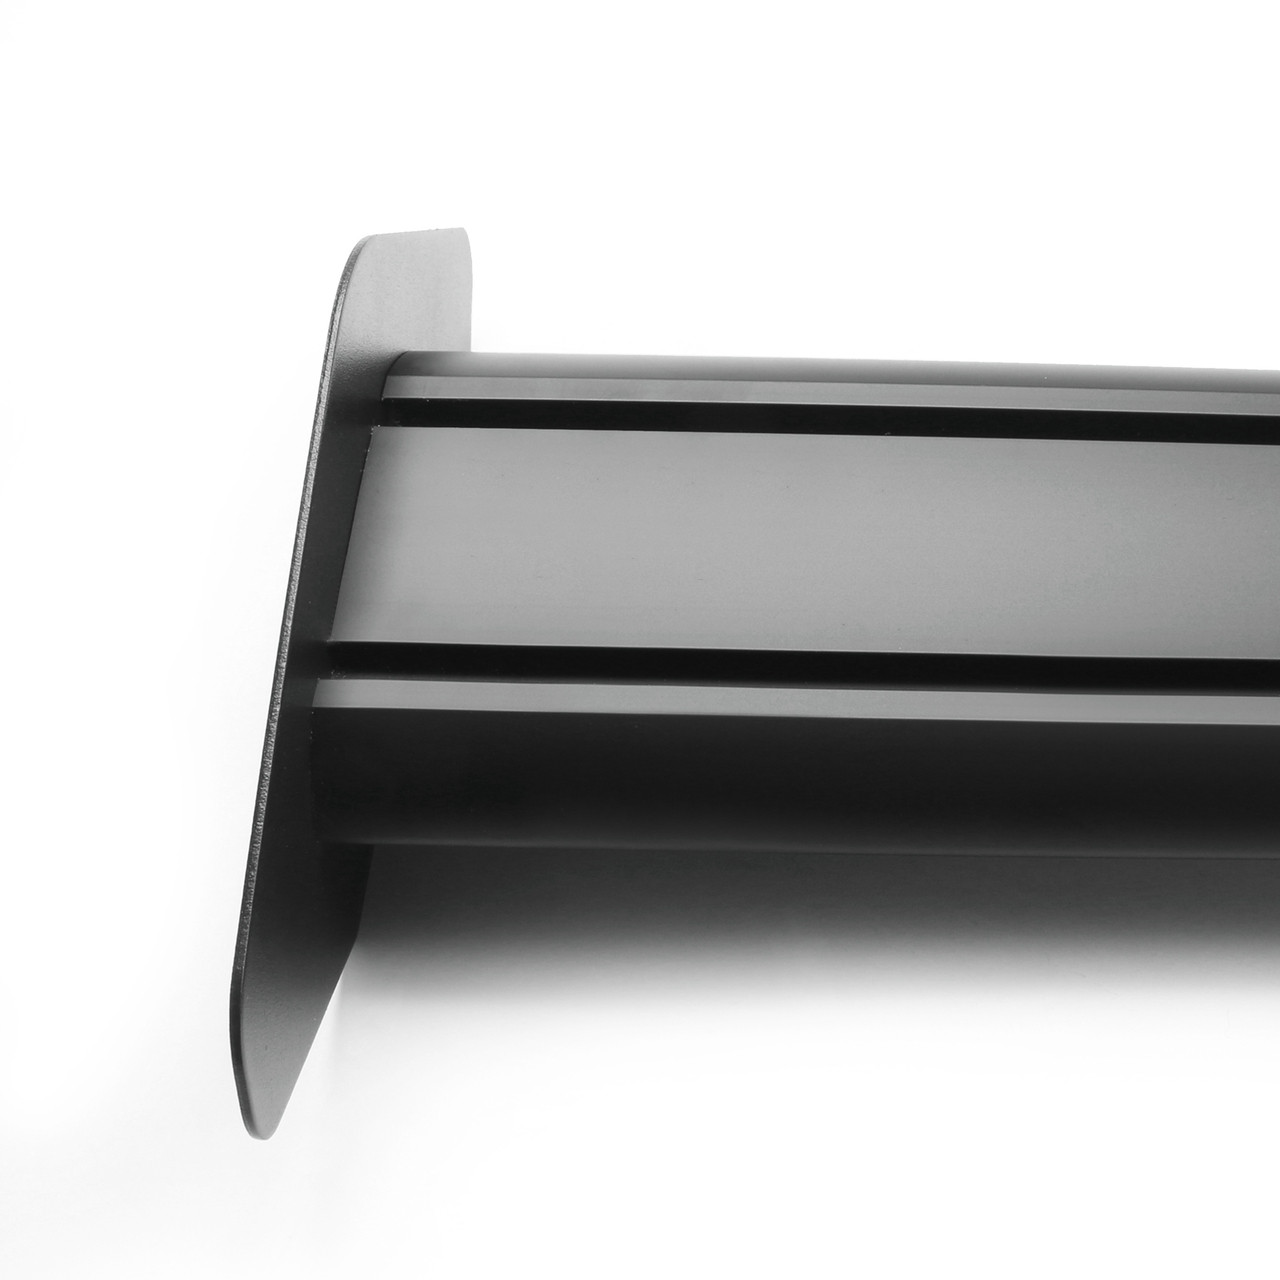 135cm Universal Hatch Adjustable Aluminum GT Rear Trunk Racing Spoiler Wing, Black